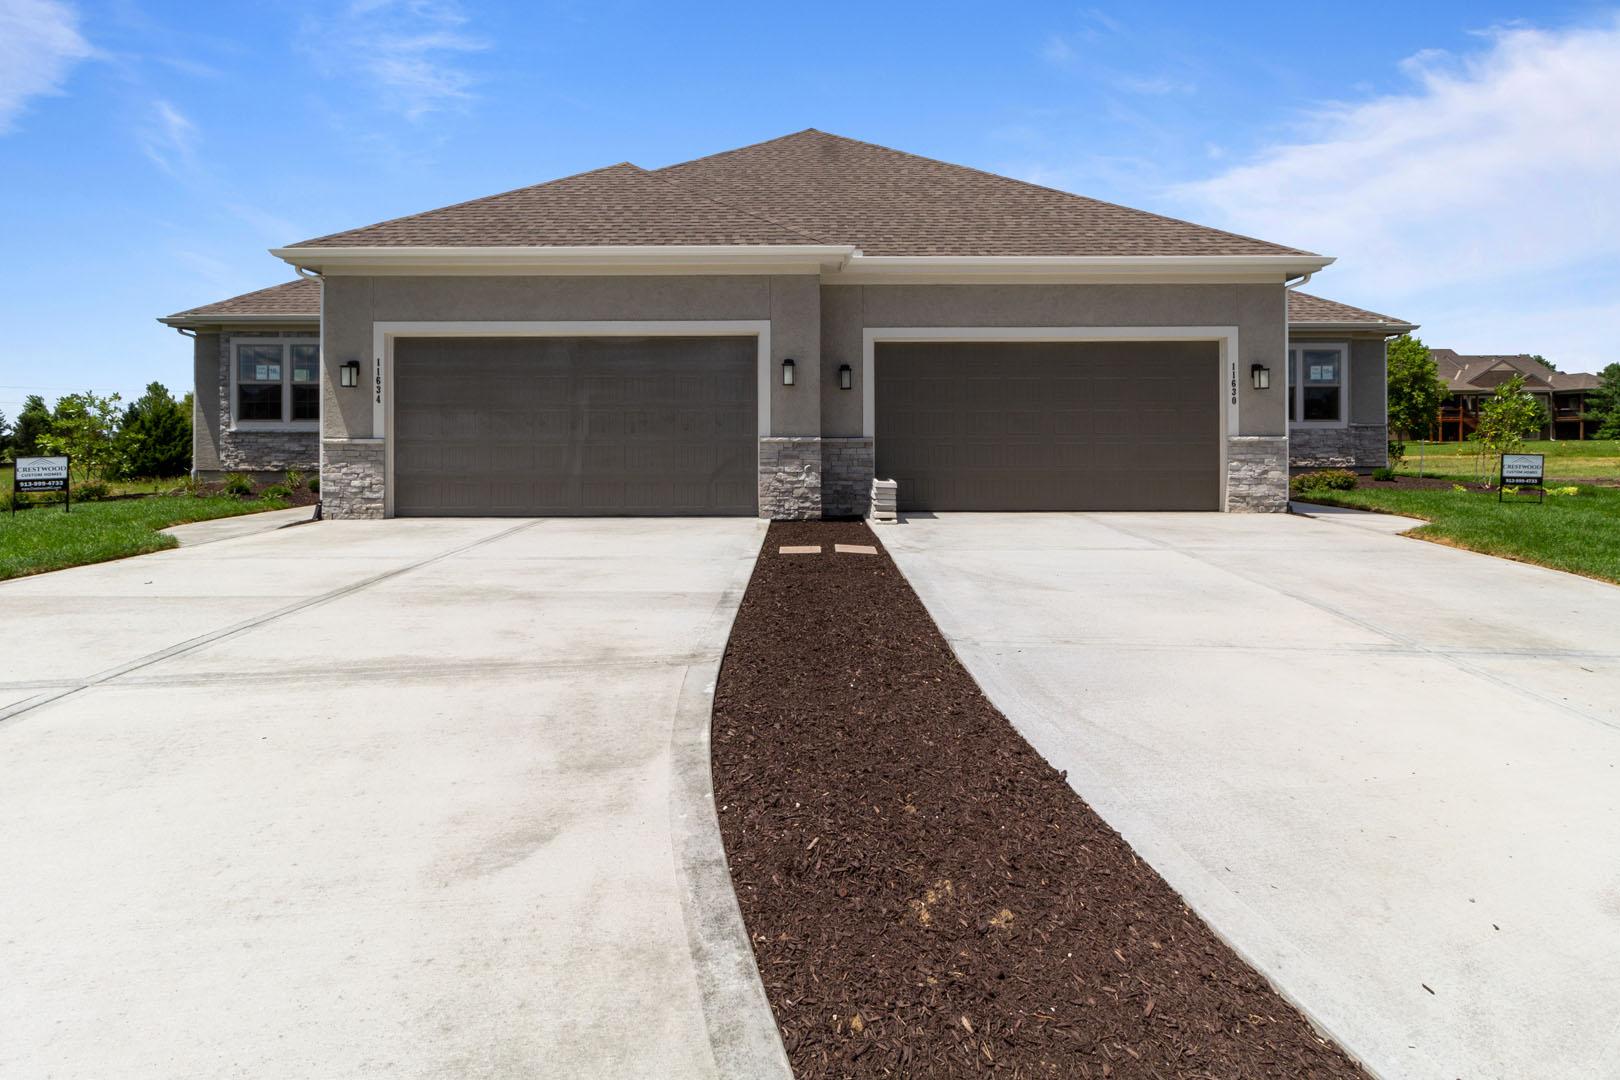 New homes in Olathe